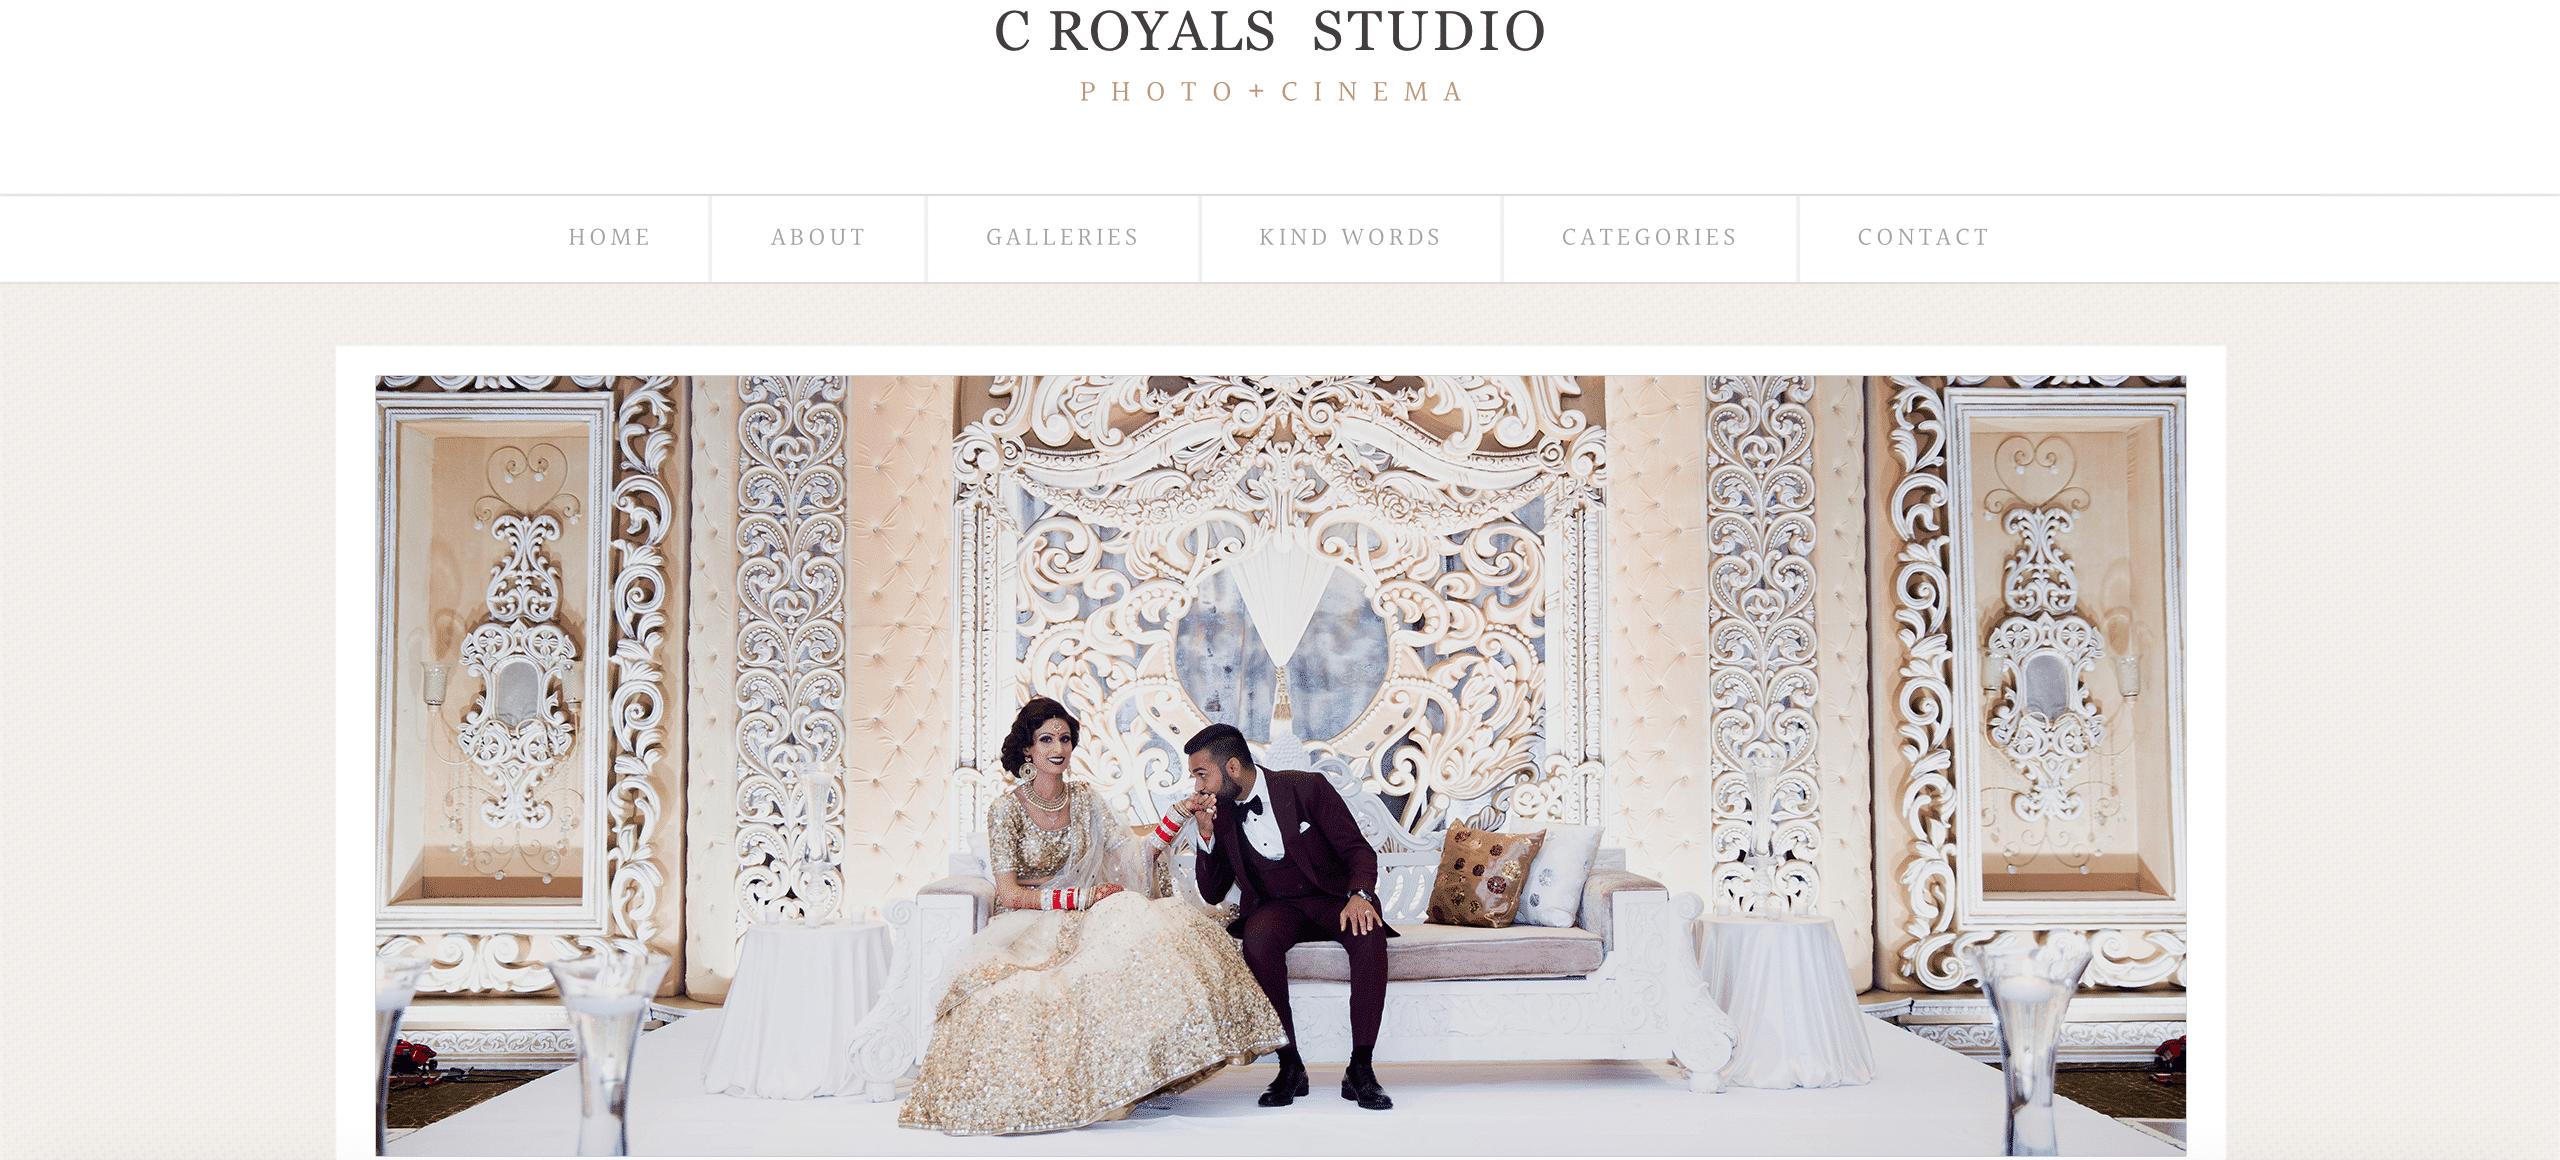 C. Royals Studio